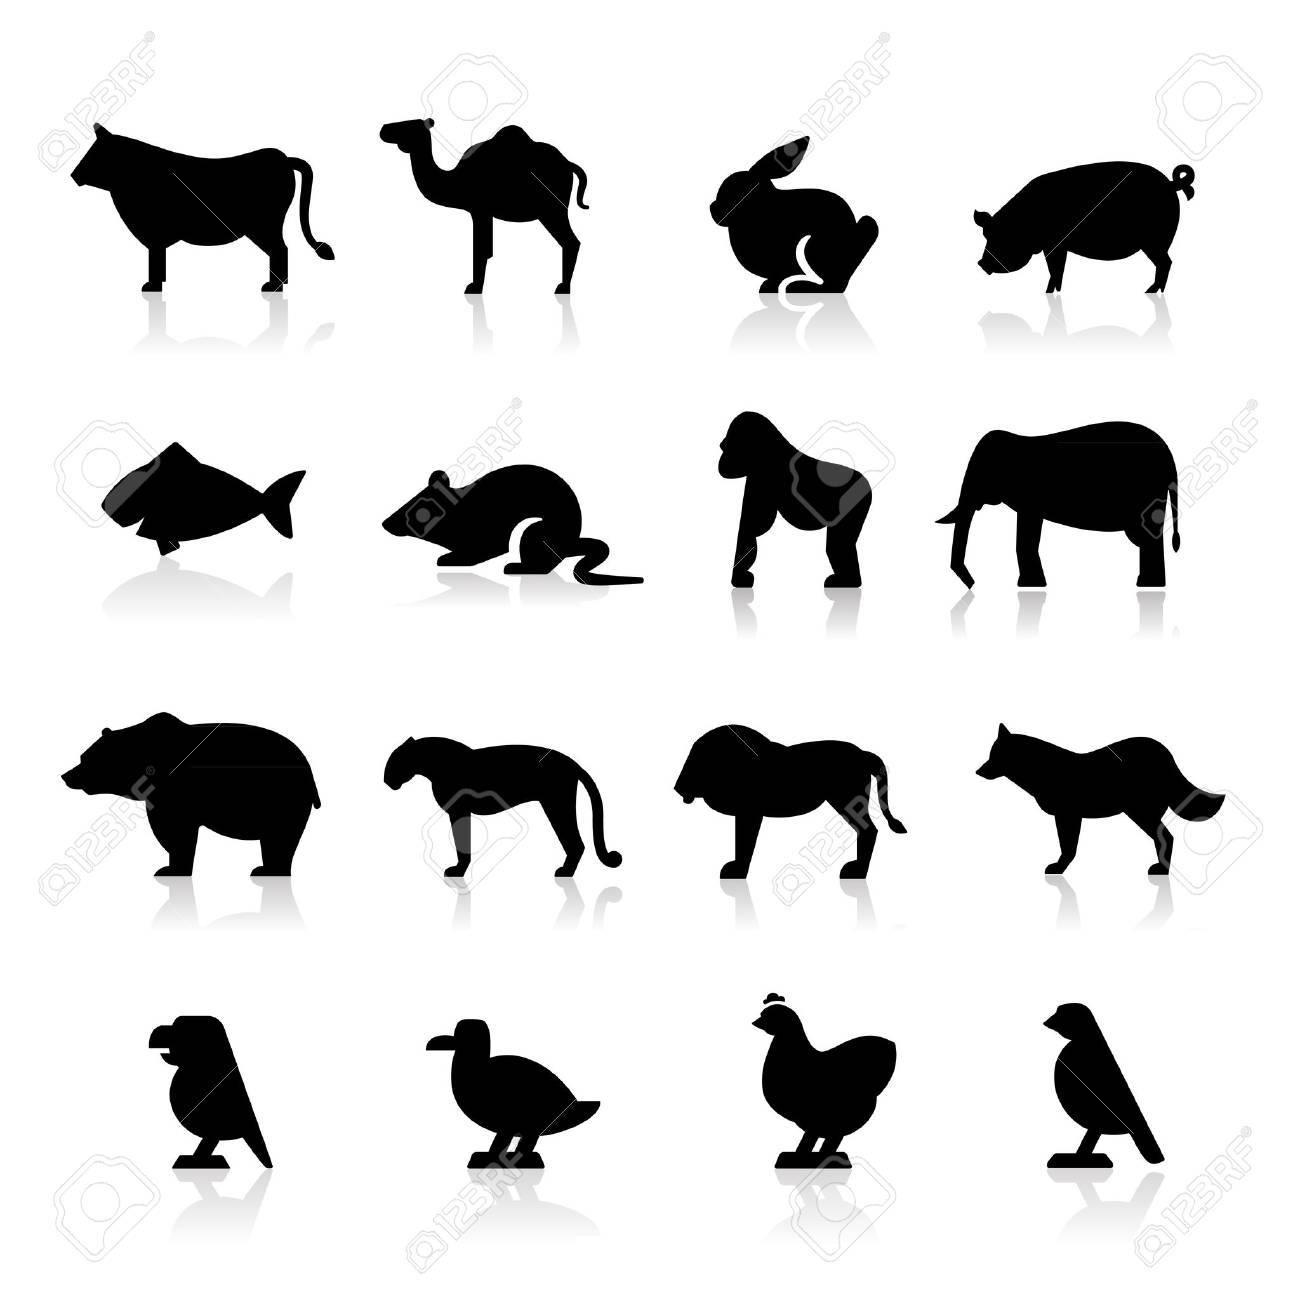 Animals icons Stock Vector - 14676397